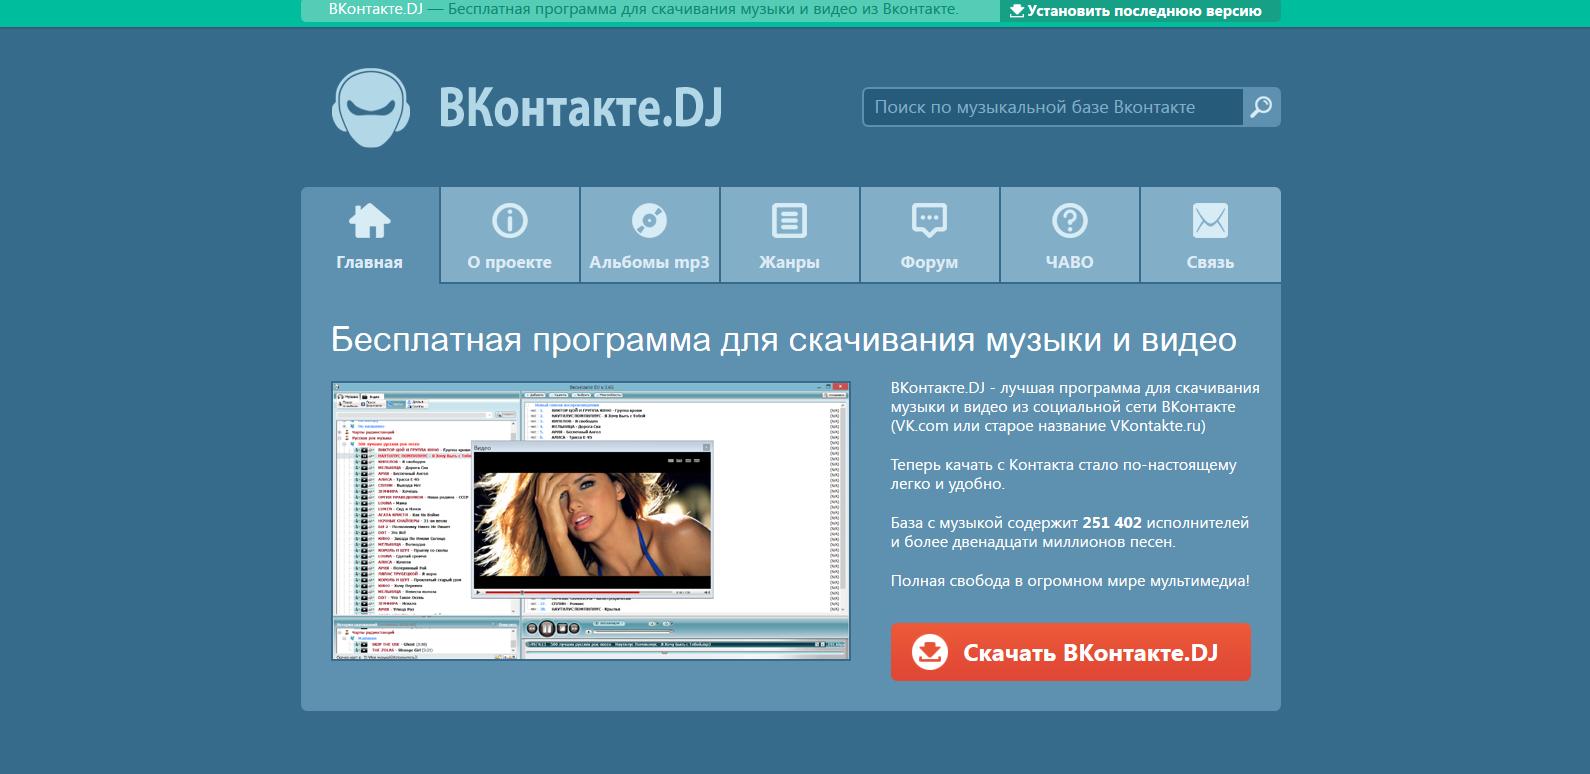 VKontakte.DJ Hijacker